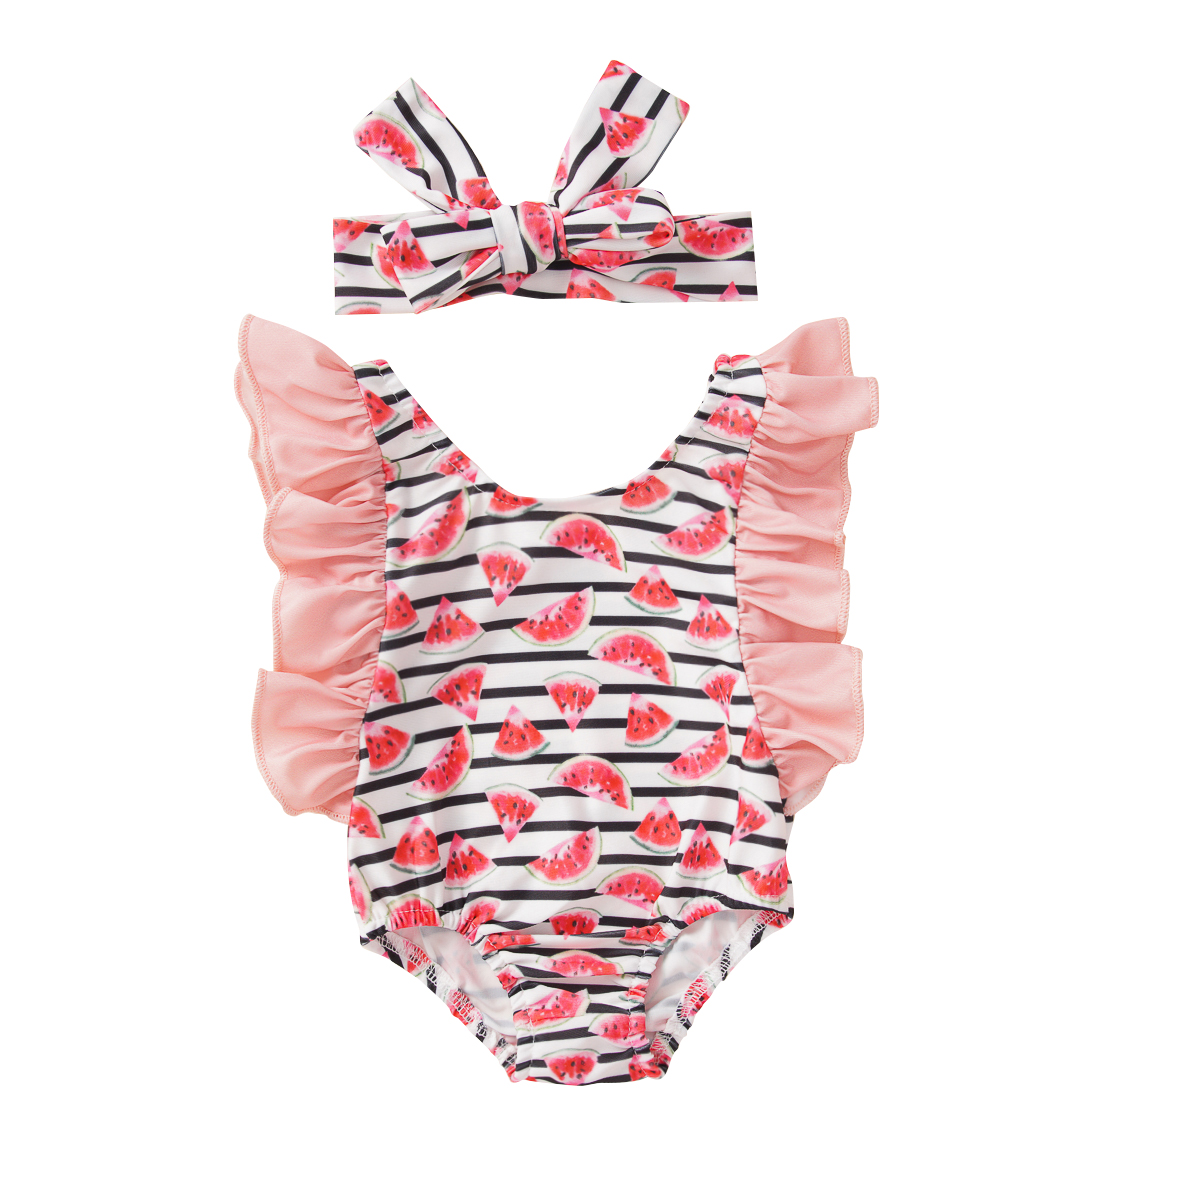 Pudcoco Newborn Baby Girl Clothes Watermelon Print Striped Sleeveless Ruffle Swimsuit Swimwear Swimming Bathing Headband 2Pcs